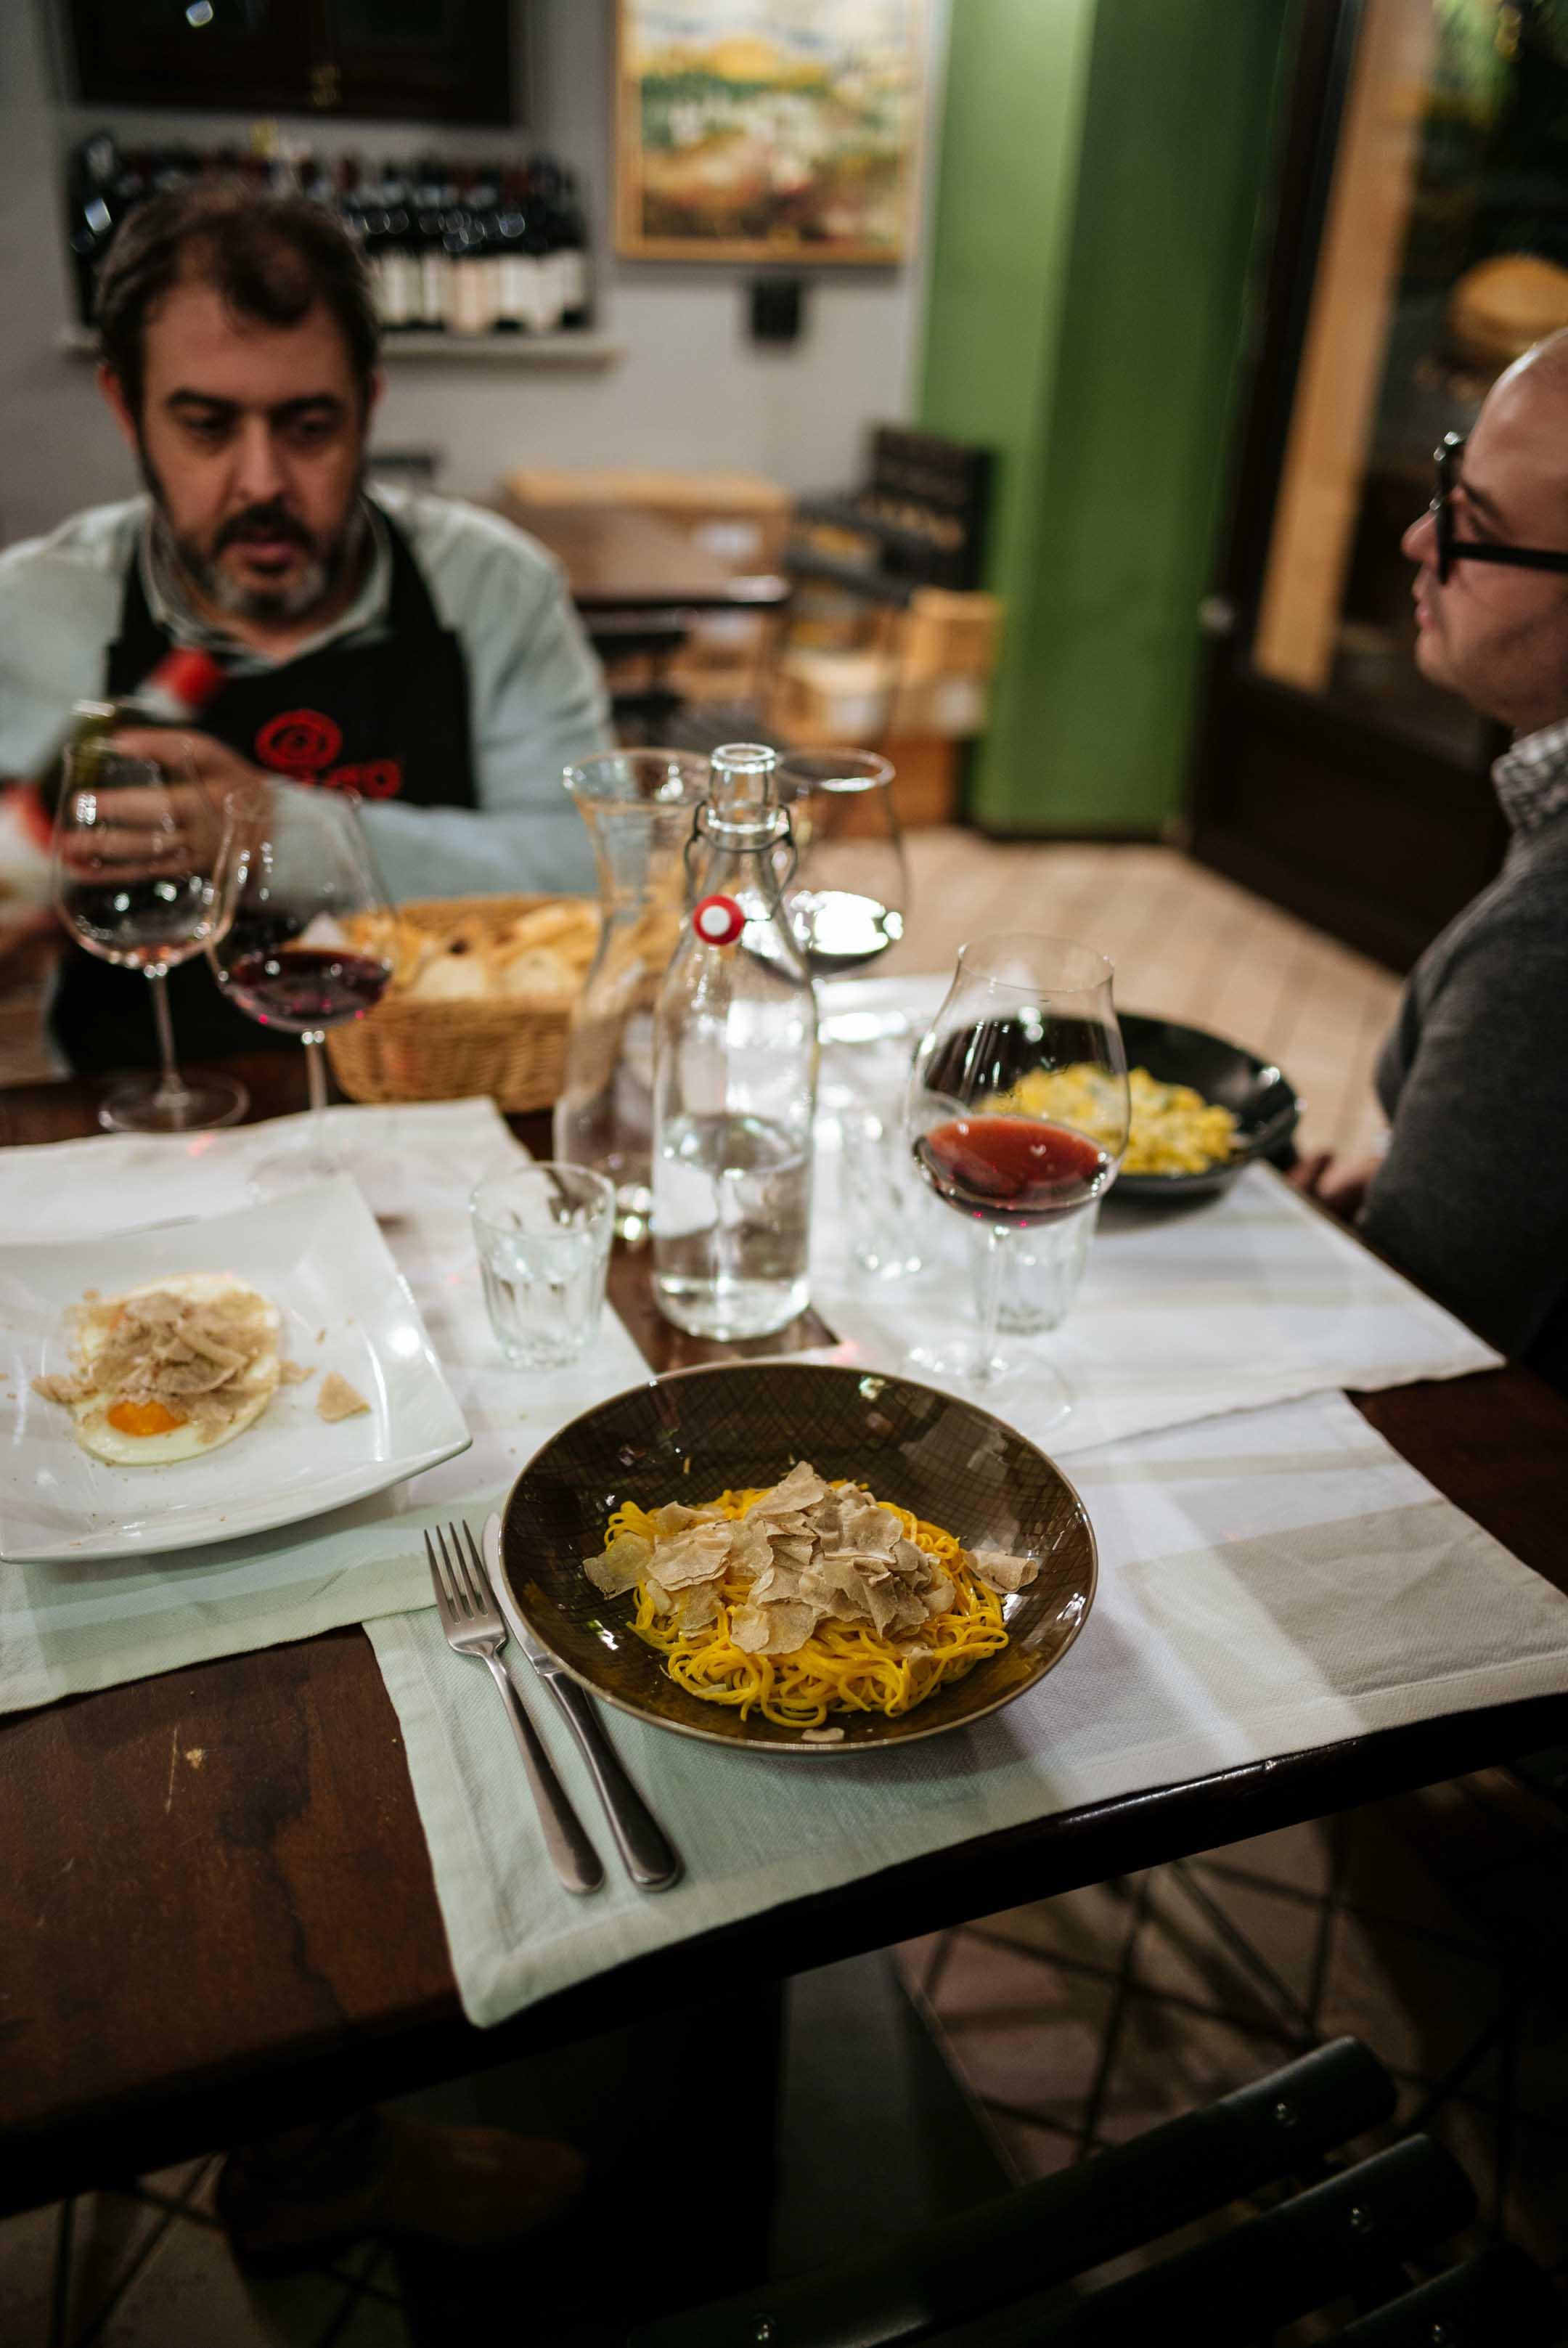 Go to Vinoteca Centro Storico in Serralunga tajarin topped with fresh truffles and agnolotti